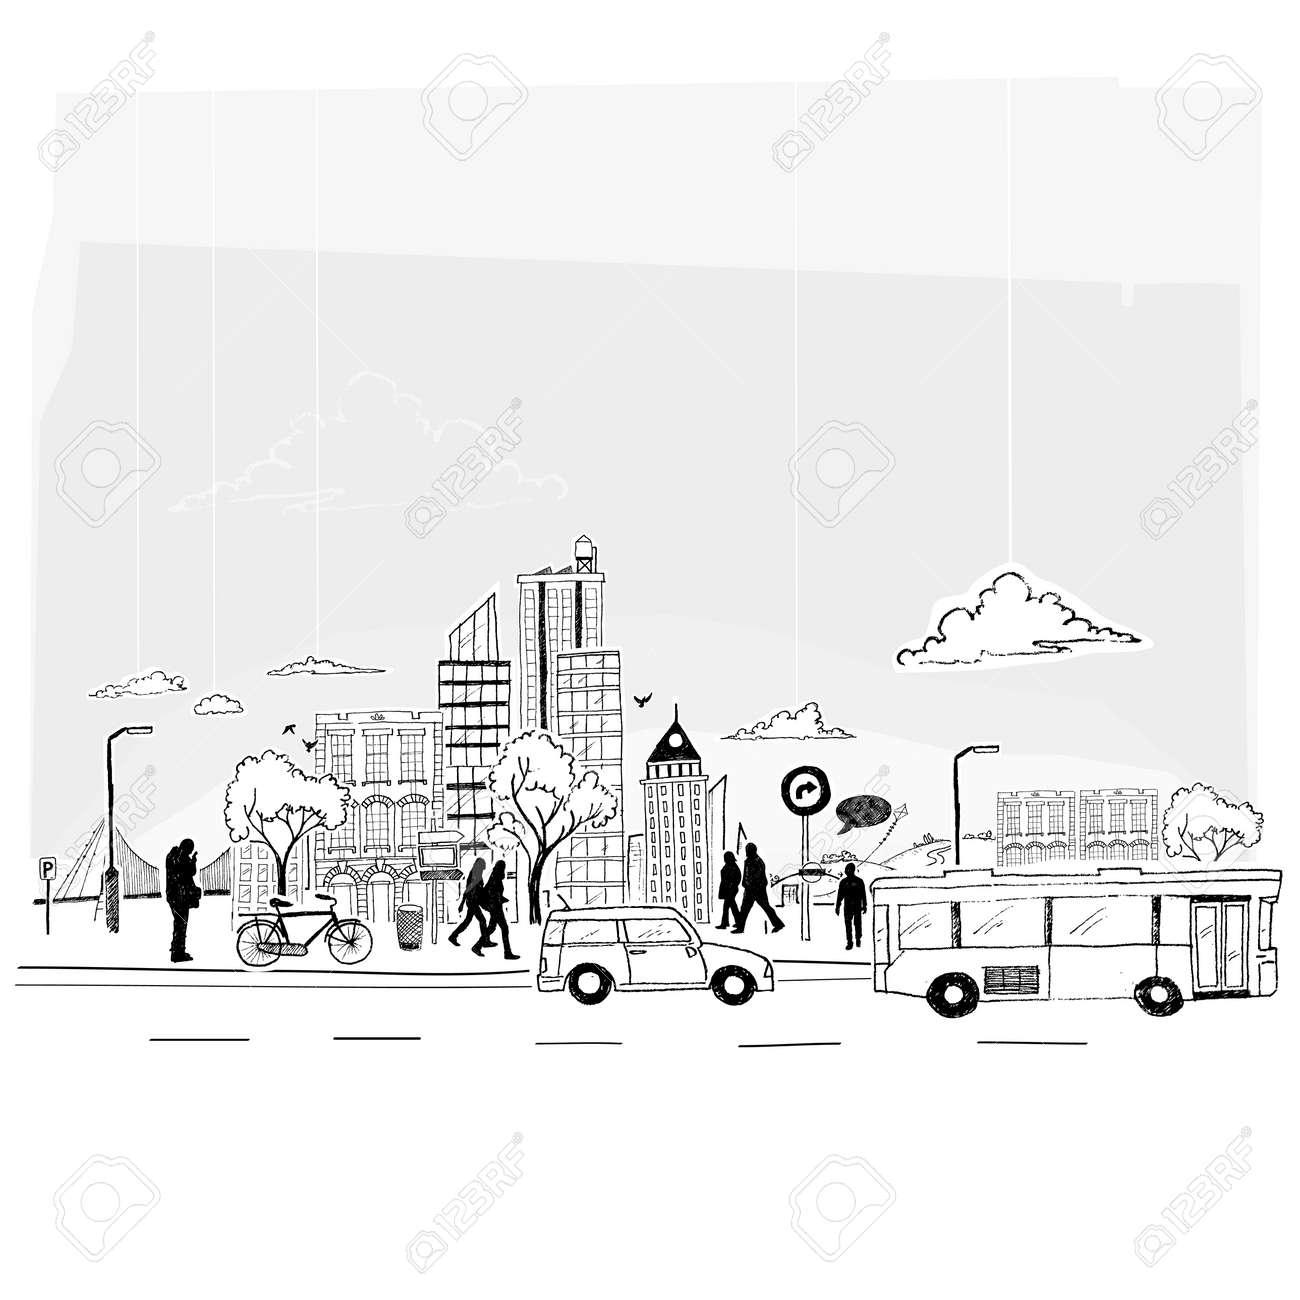 Paper City Stock Vector - 18261012